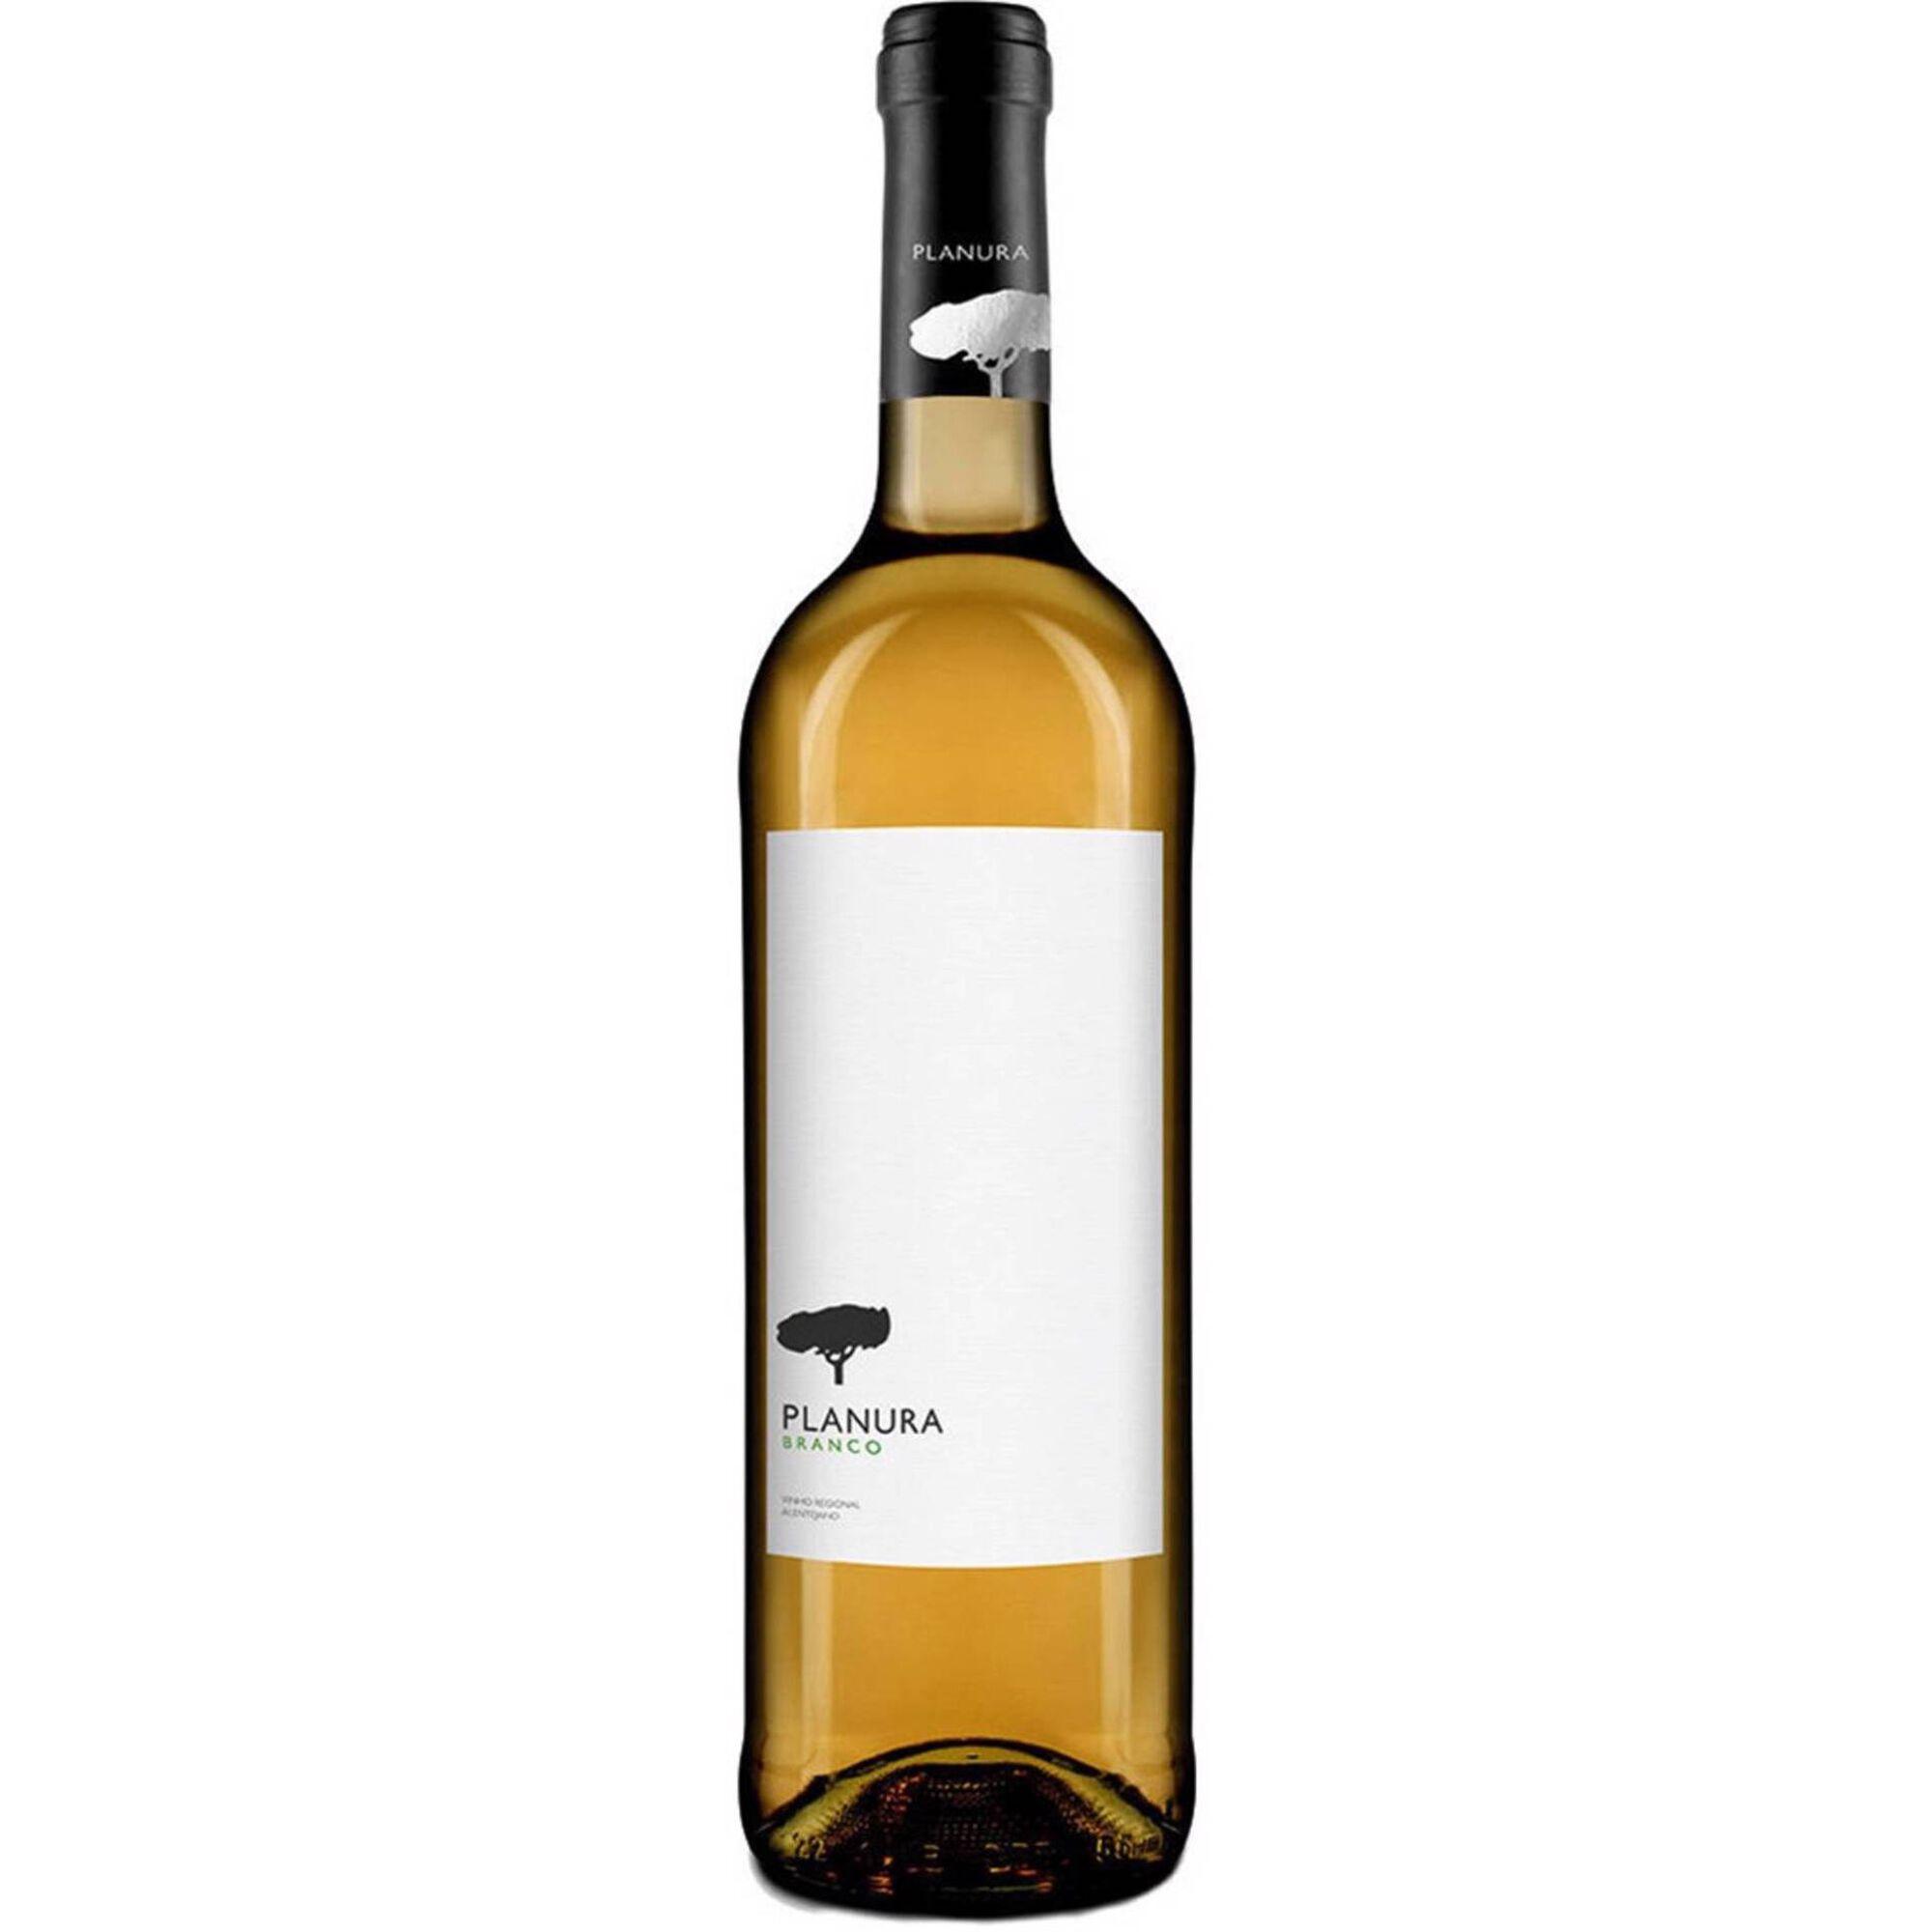 Planura Regional Alentejano Vinho Branco